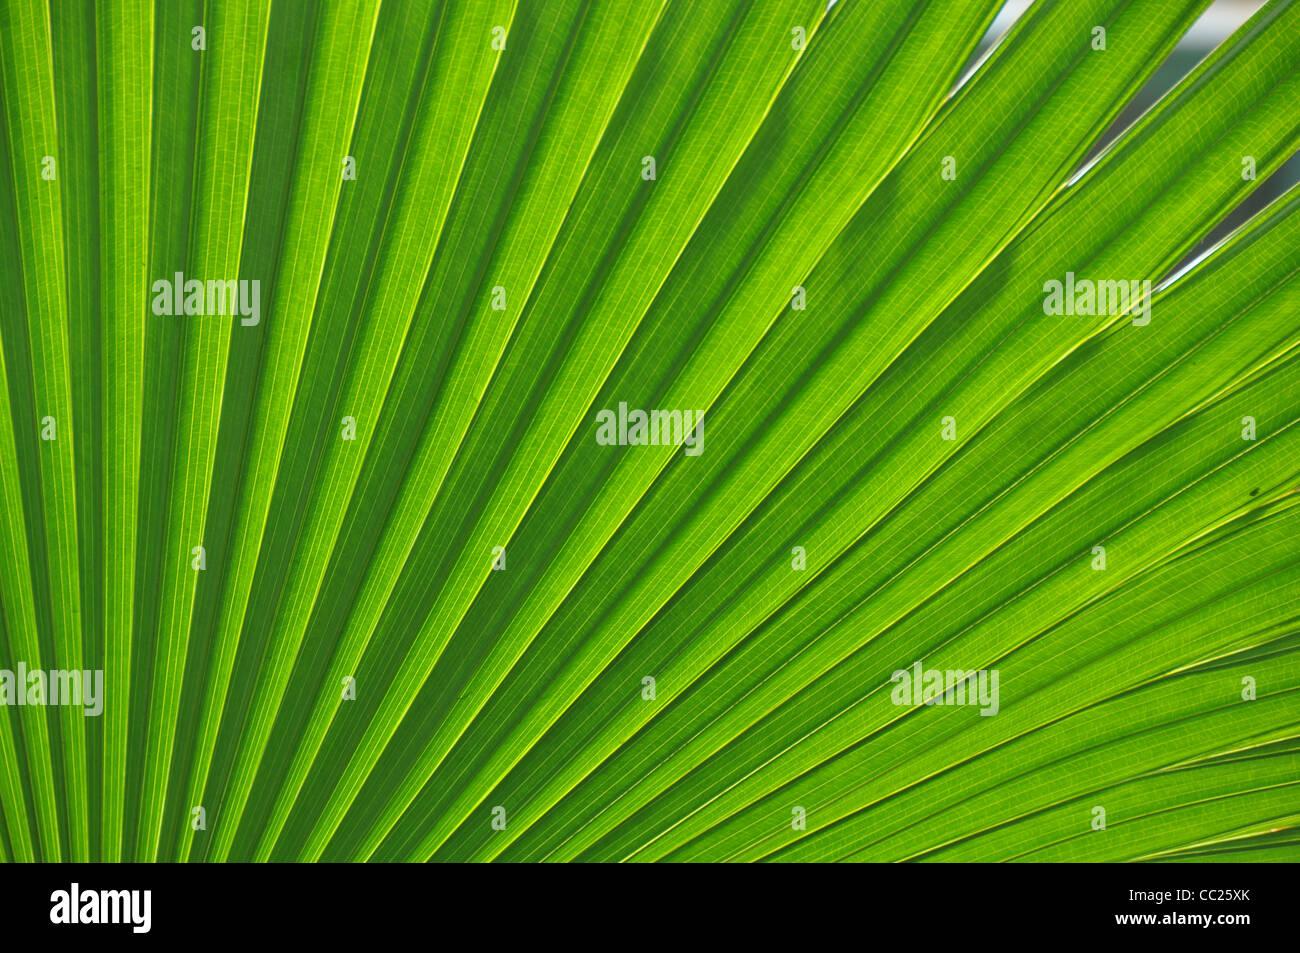 Frische grüne Blätter Stockbild